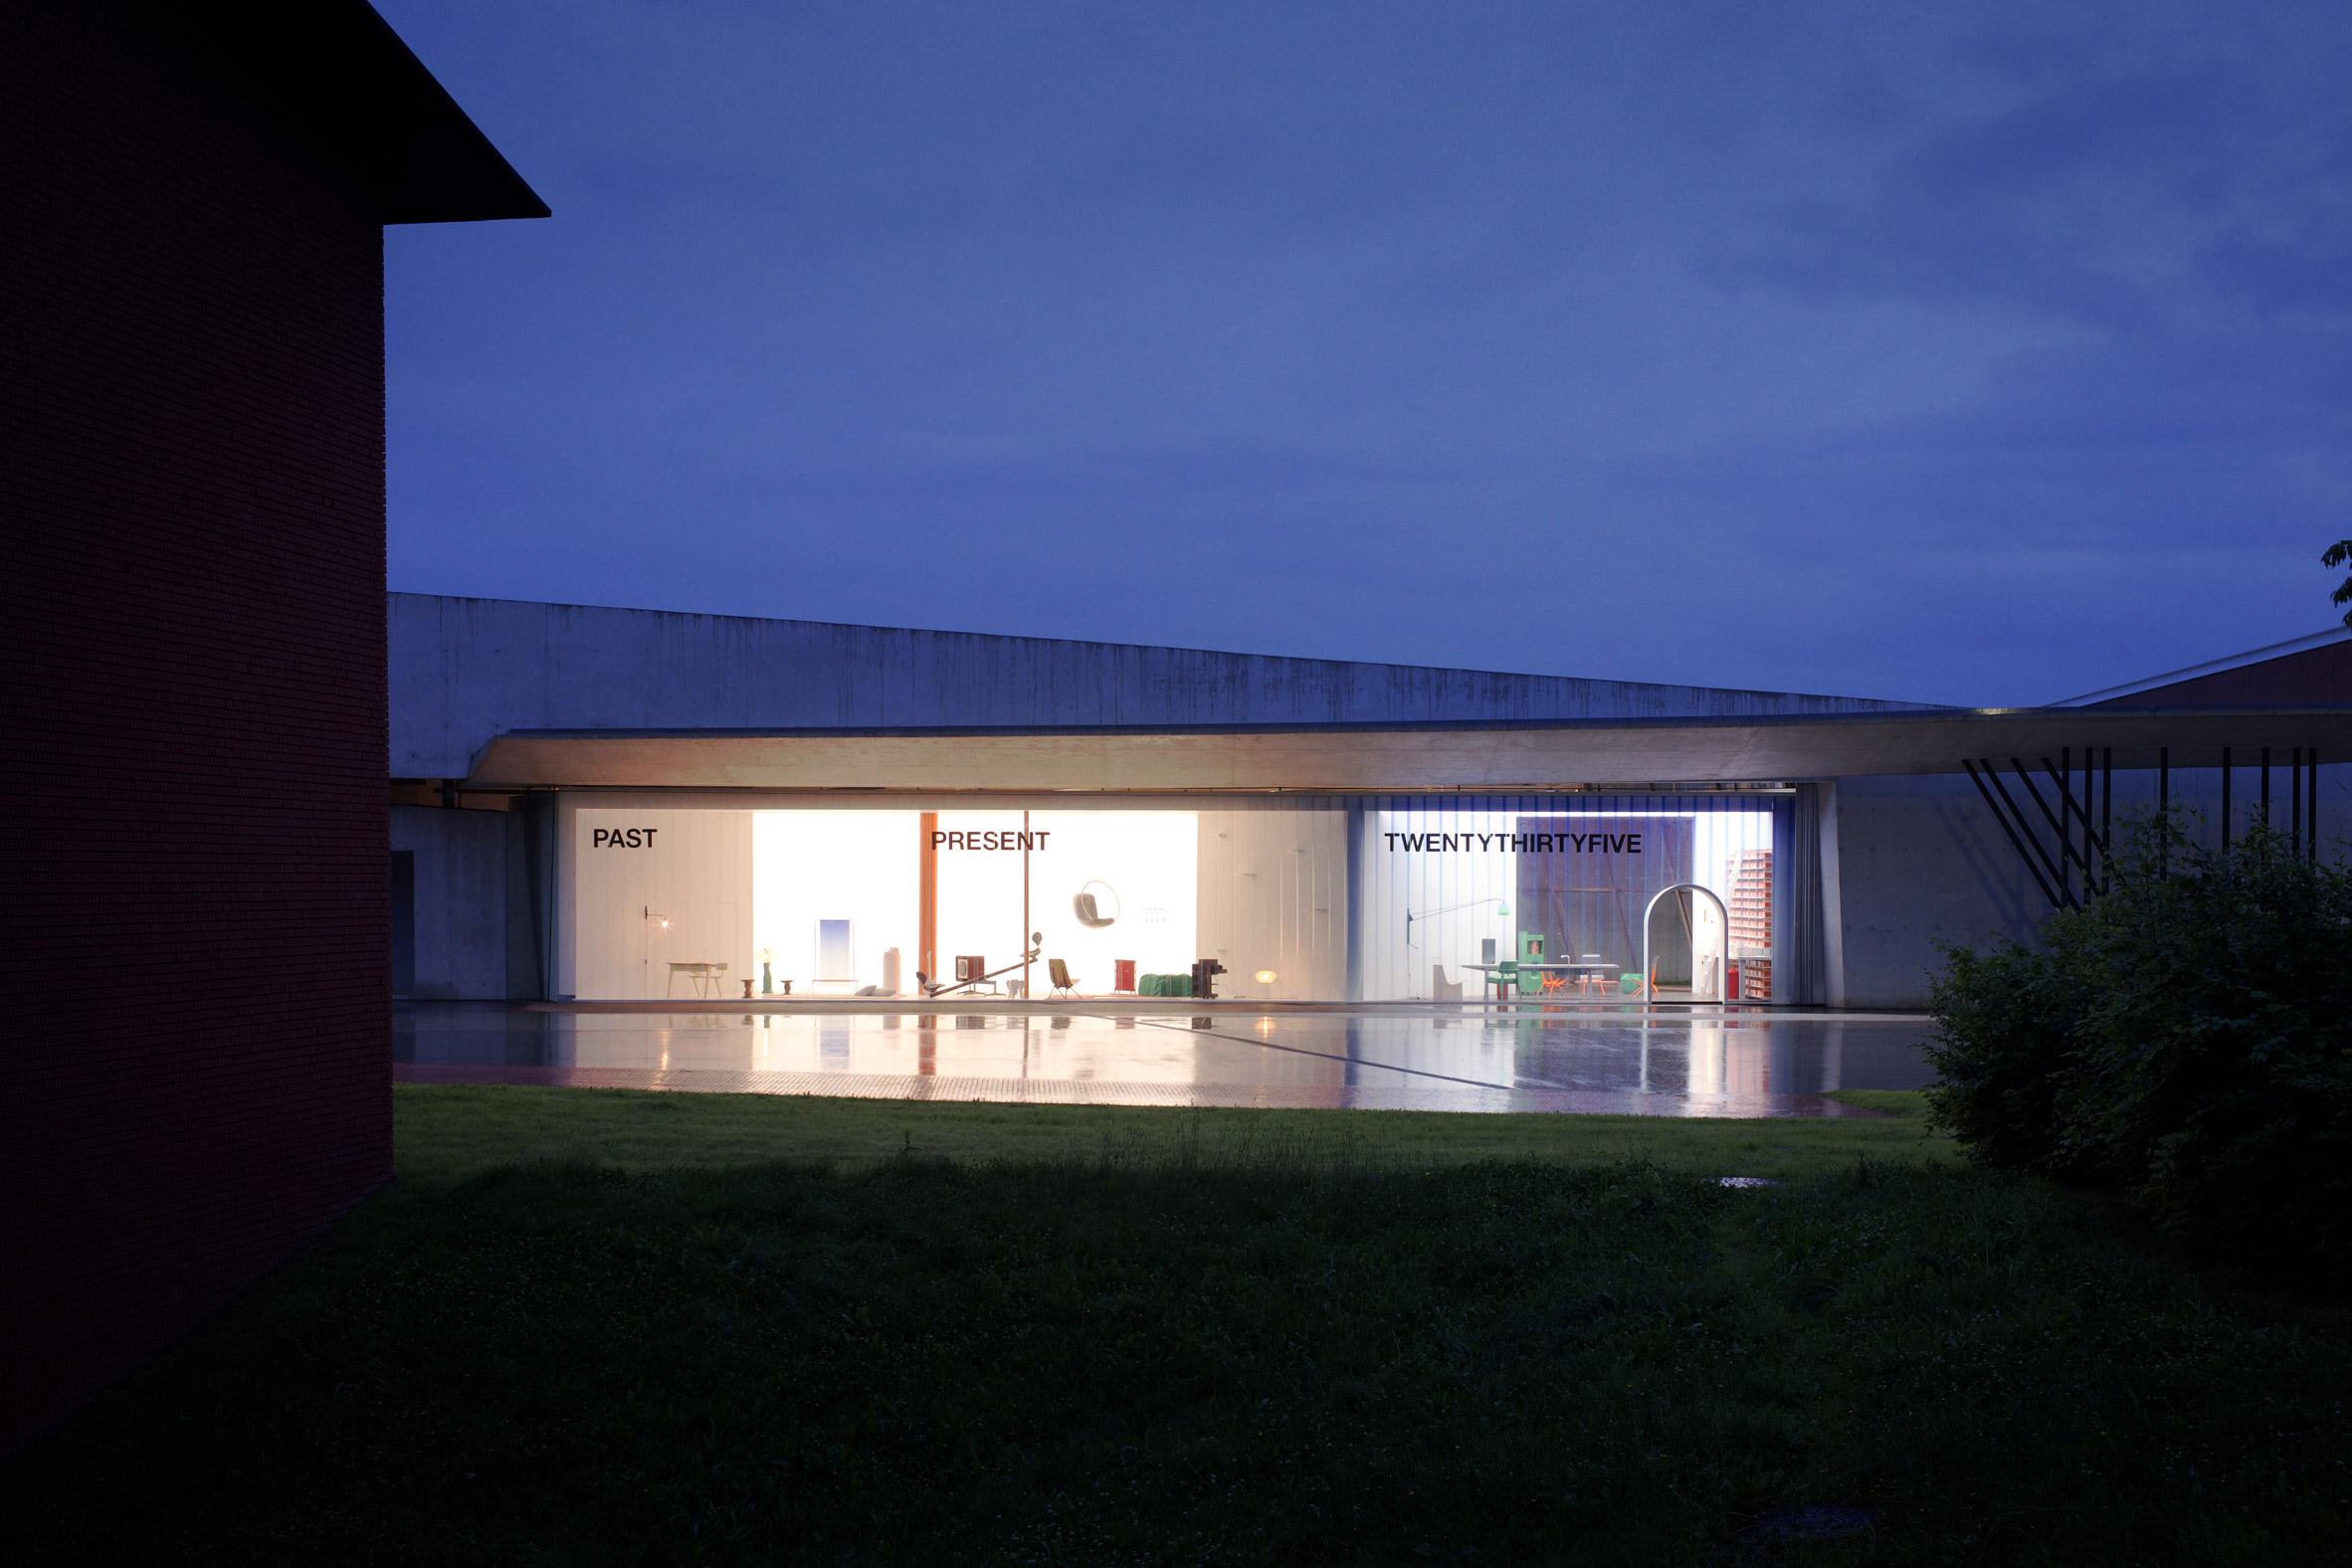 vitra-virgil-abloh-house-future-2035_dezeen_2364_col_2.jpg